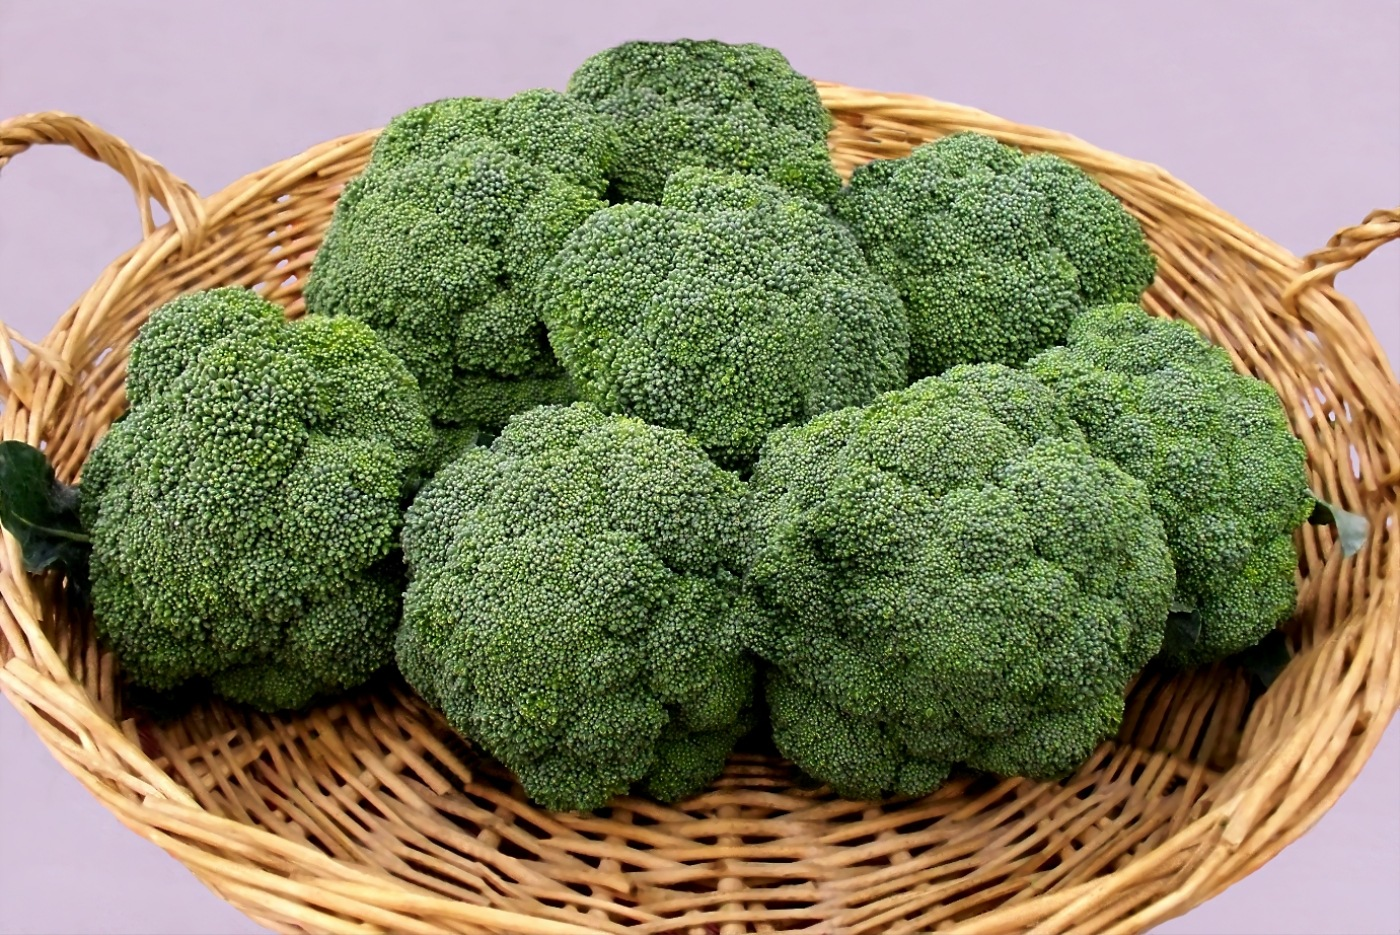 Broccoli 1 by RMCROC